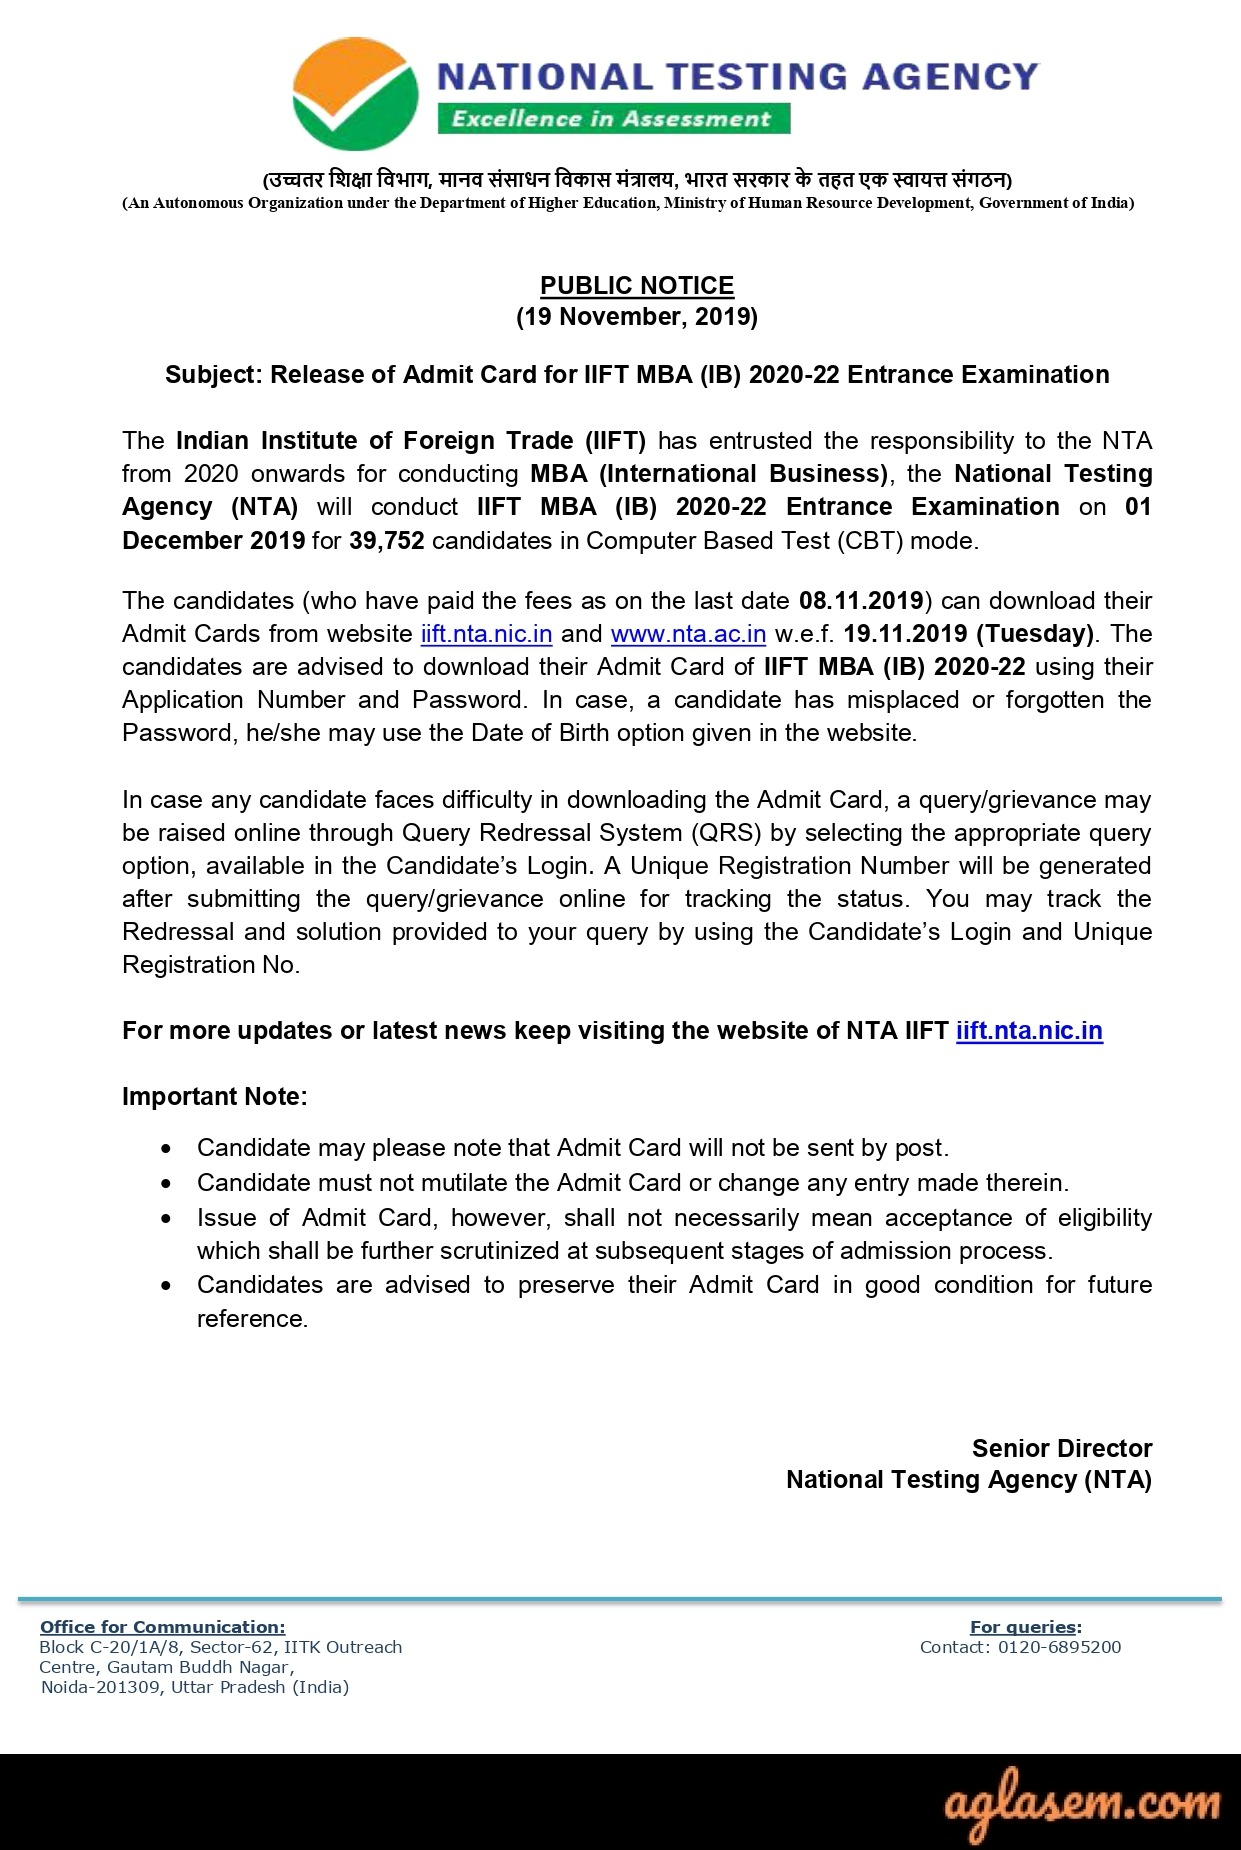 IIFT 2020 Admit Card Notice